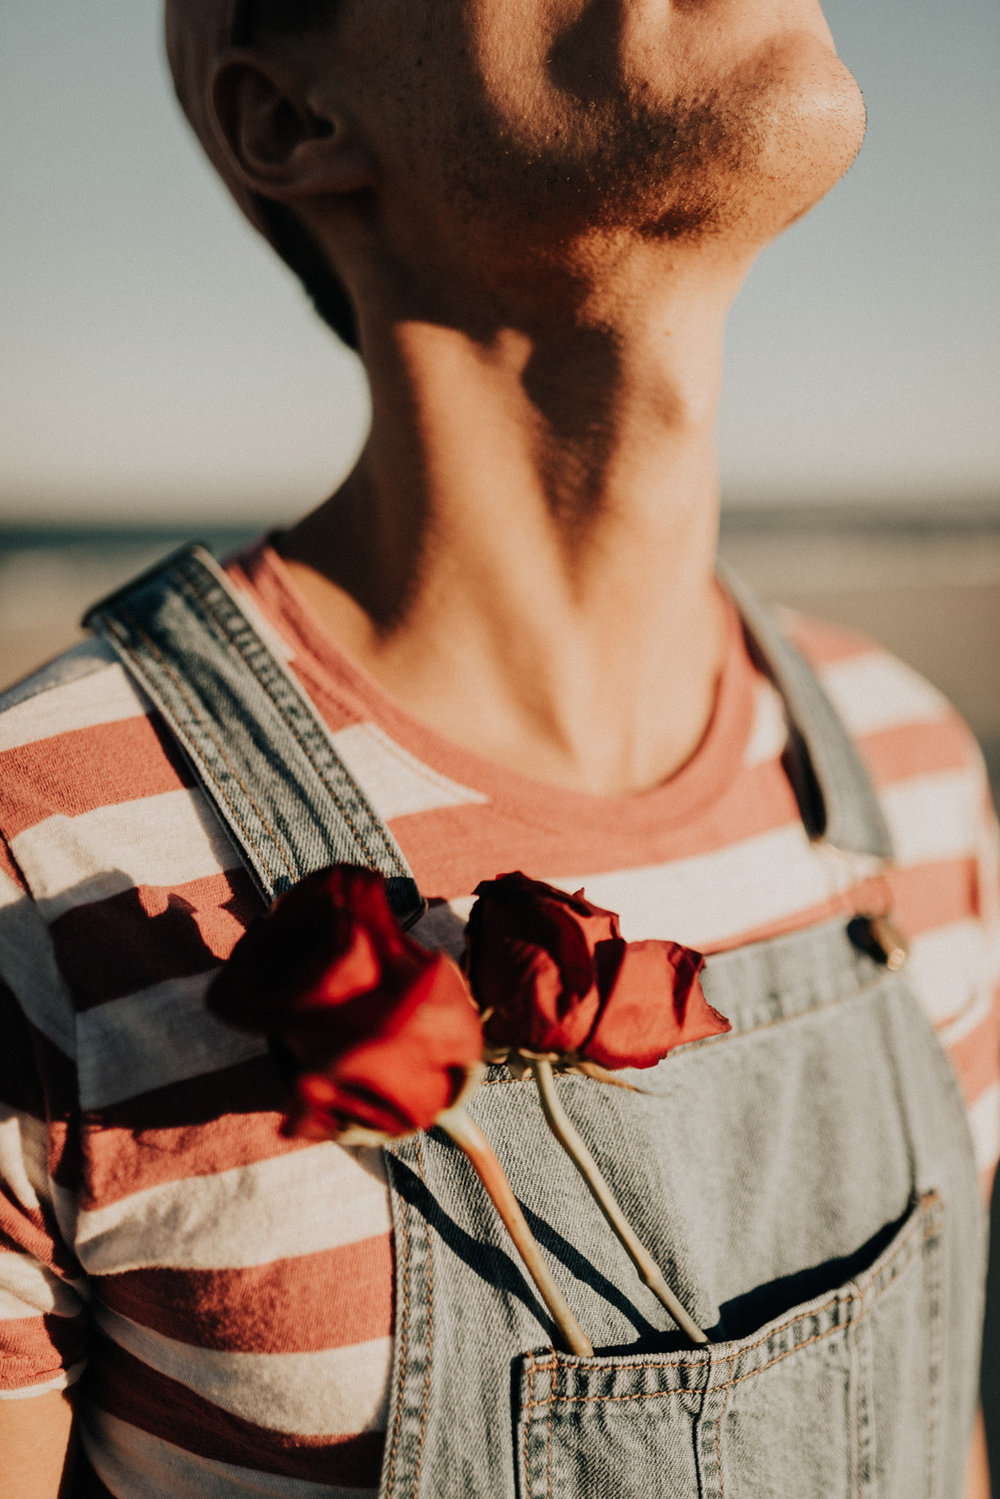 KyleWillisPhoto-Kyle-Willis-Photography-Portland-Oregon-Asbury-Park-Nolan-Mendoza-Beach-Male-Model-New-Jersey-Philadelphia-Photographer-Lifestyle-Portrait-Ocean-Grove-Wilhelmina